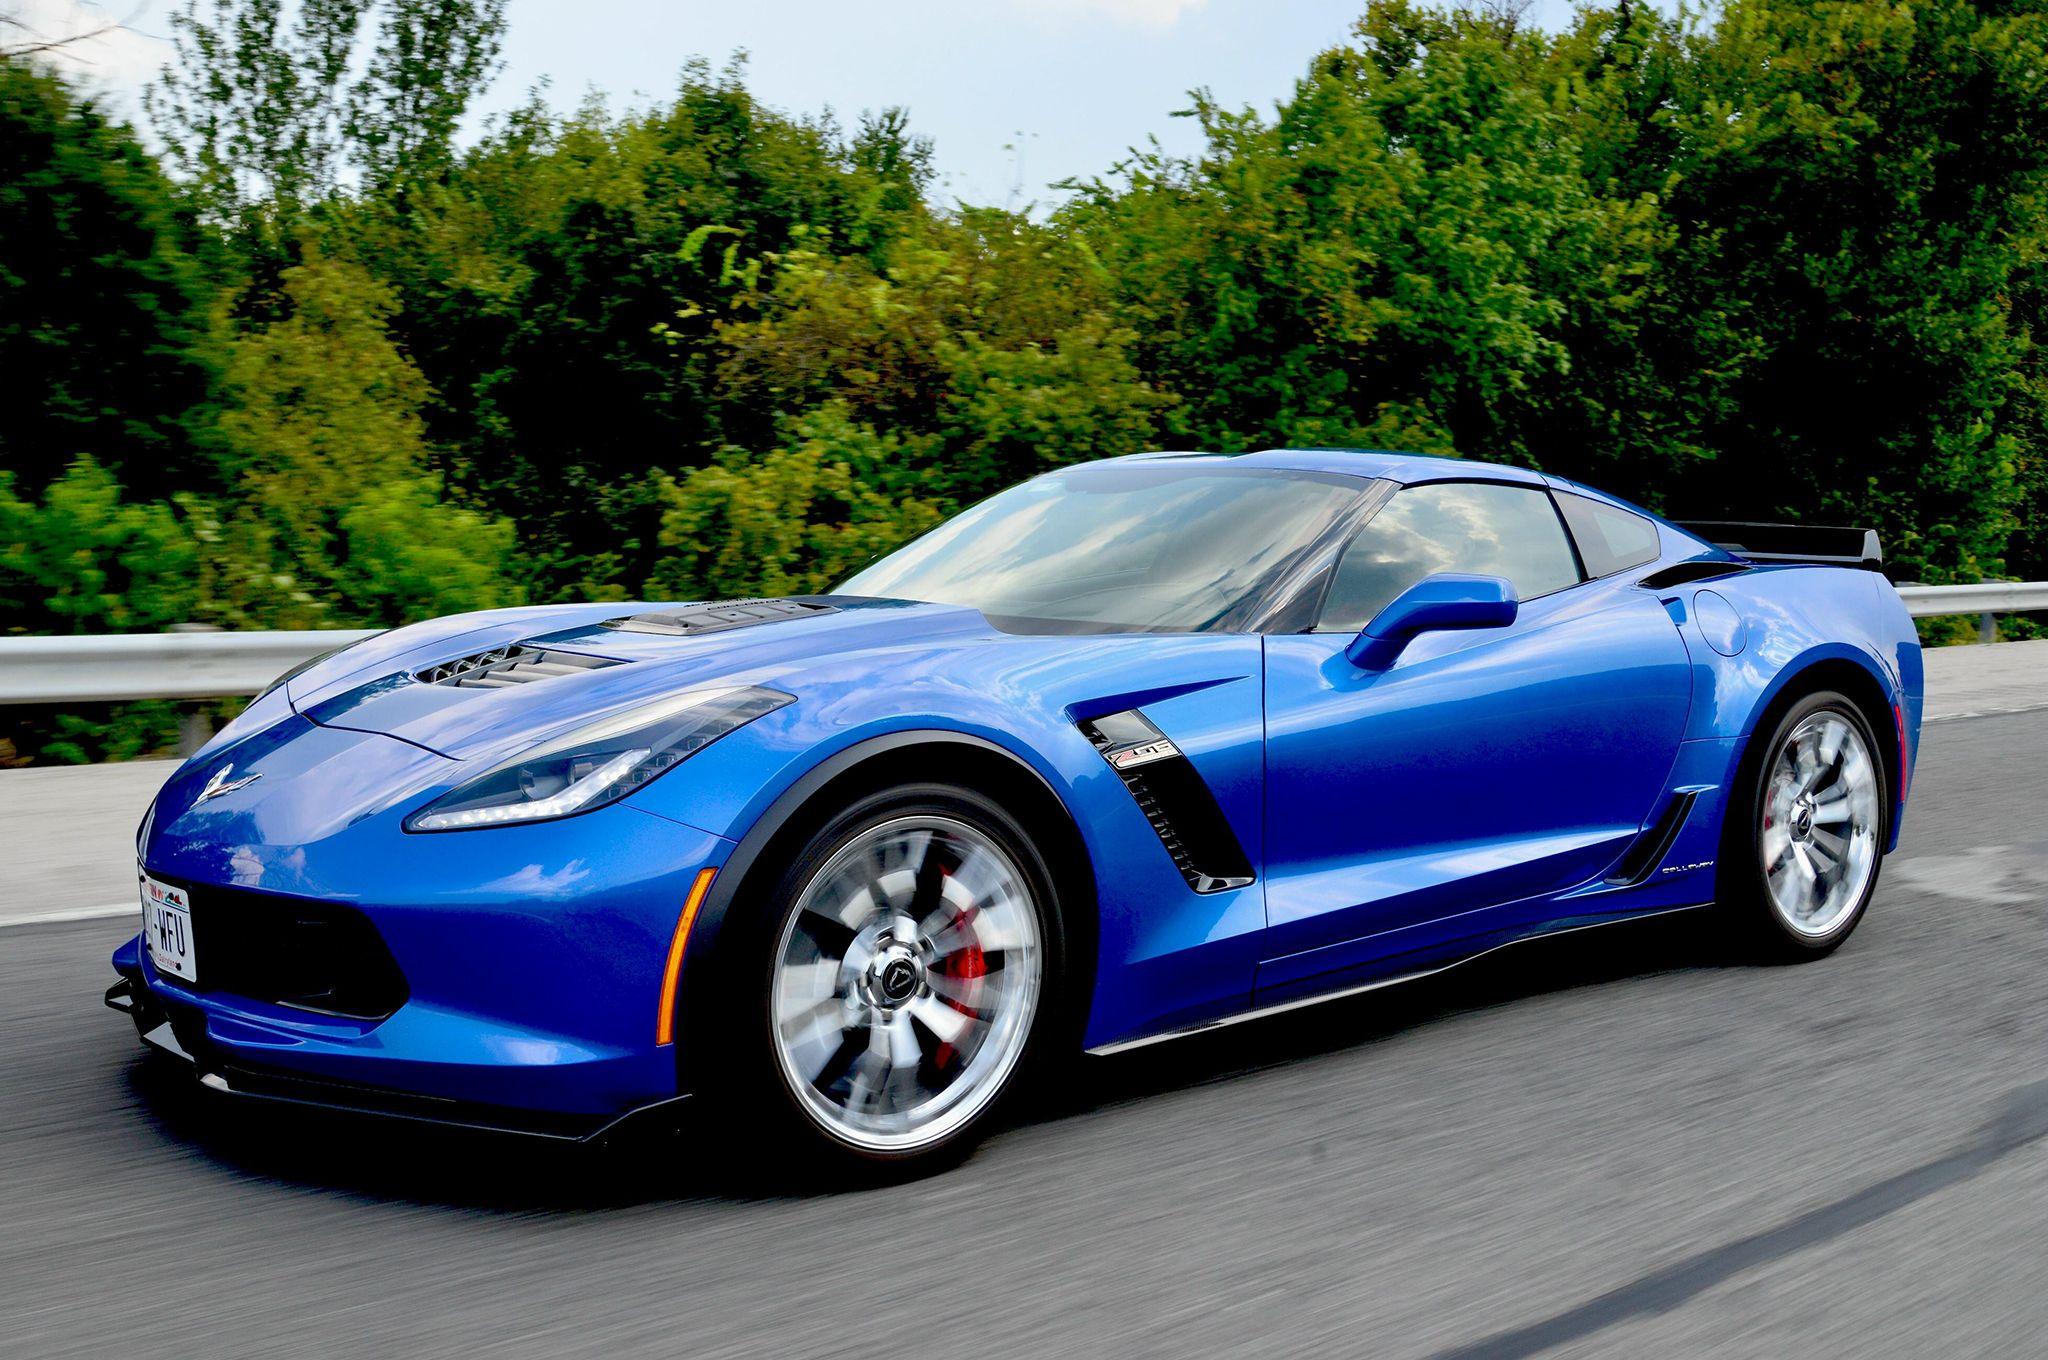 C7_callaway_corvette_blue_z06